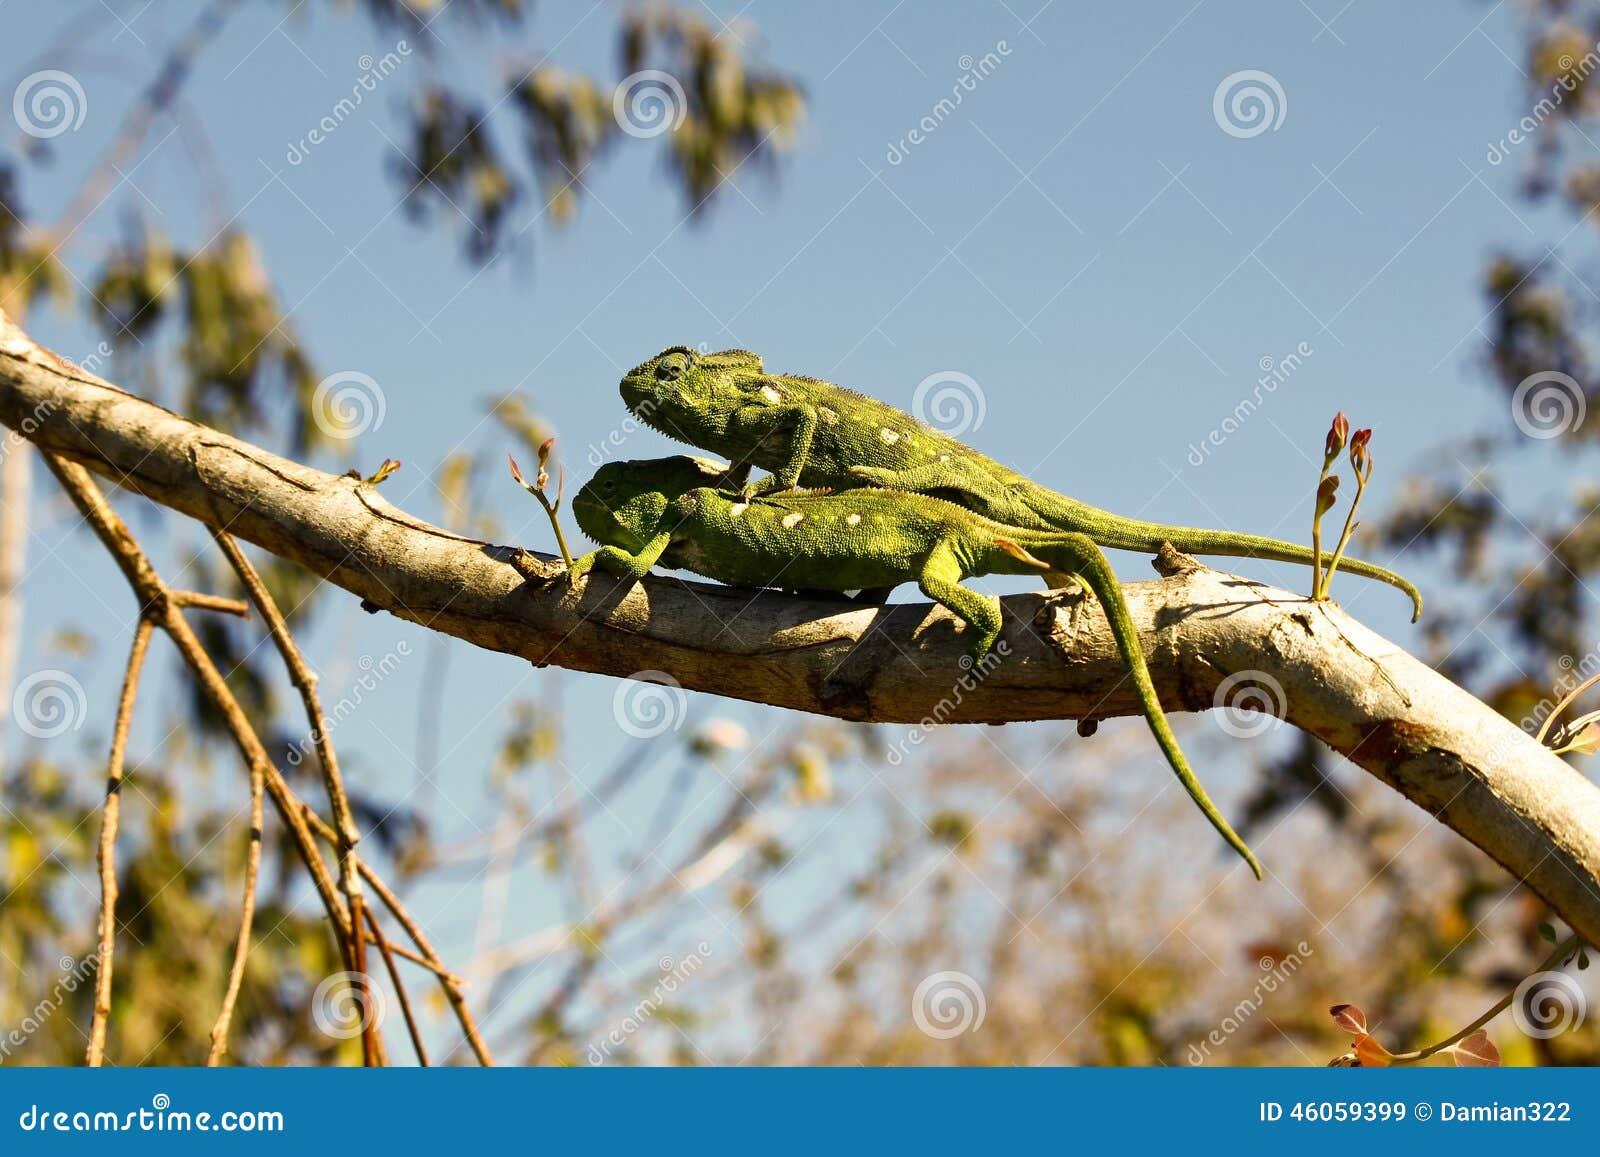 Two Carpet Chameleons (Furcifer lateralis)